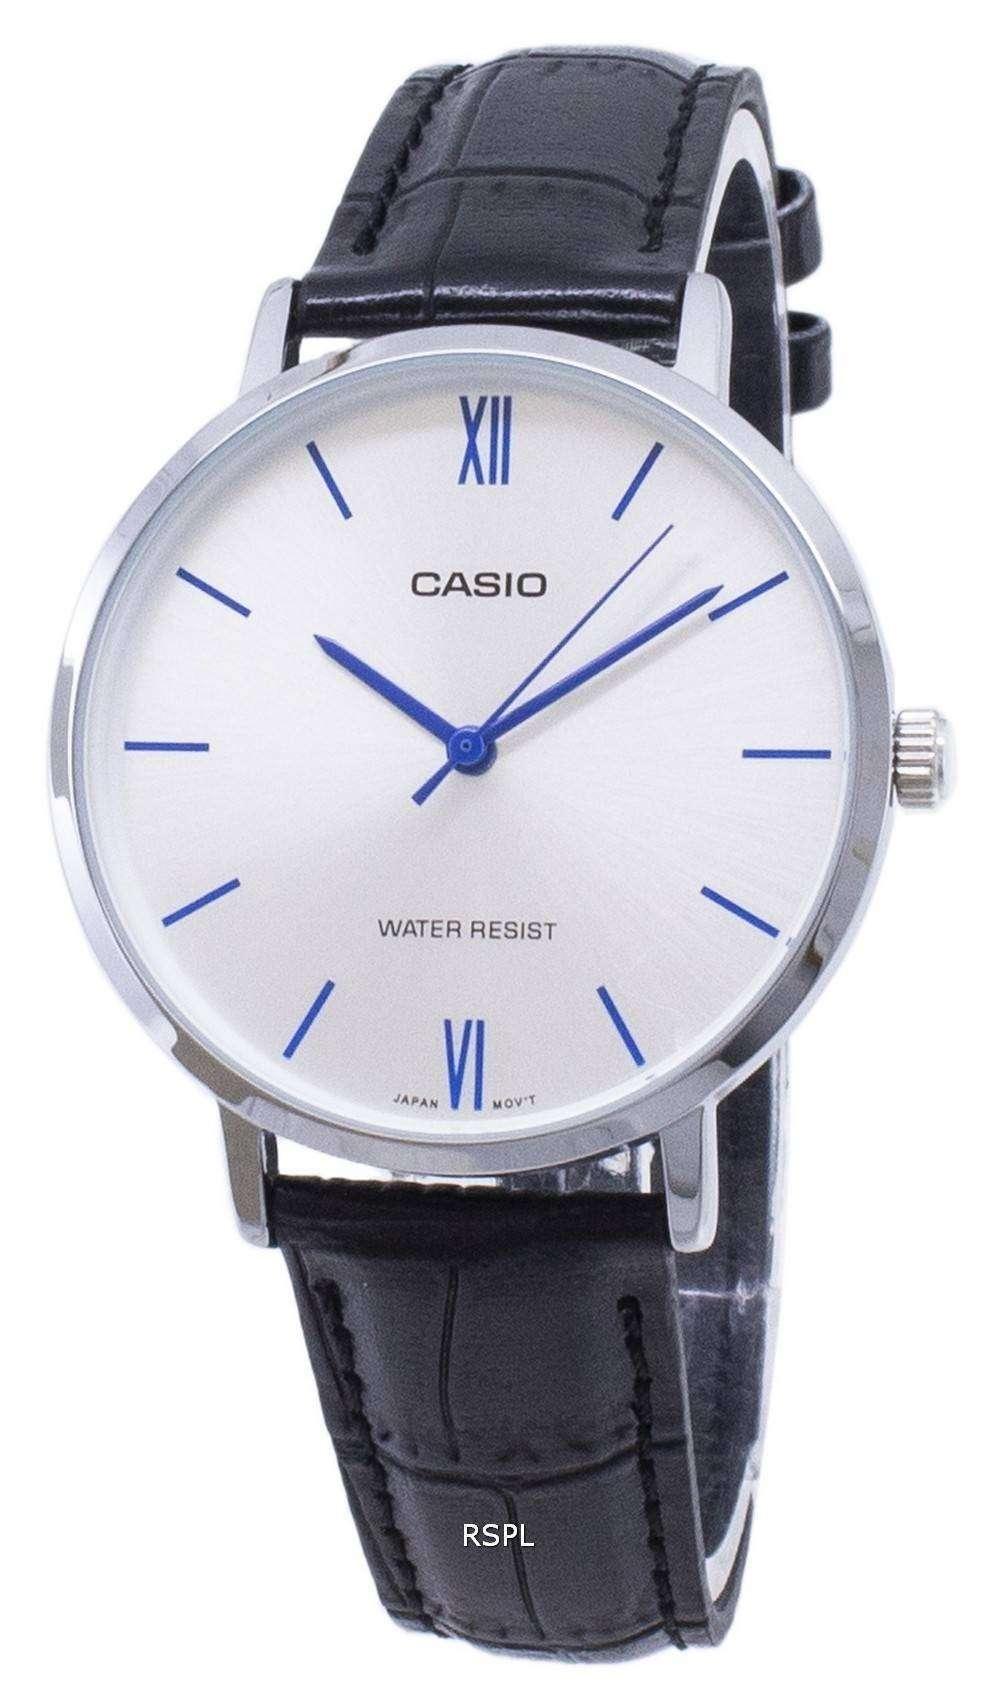 d93da1ddaf54 Reloj cuarzo Casio LTP-VT01L-7B1 analógico de la mujer - citywatches.es